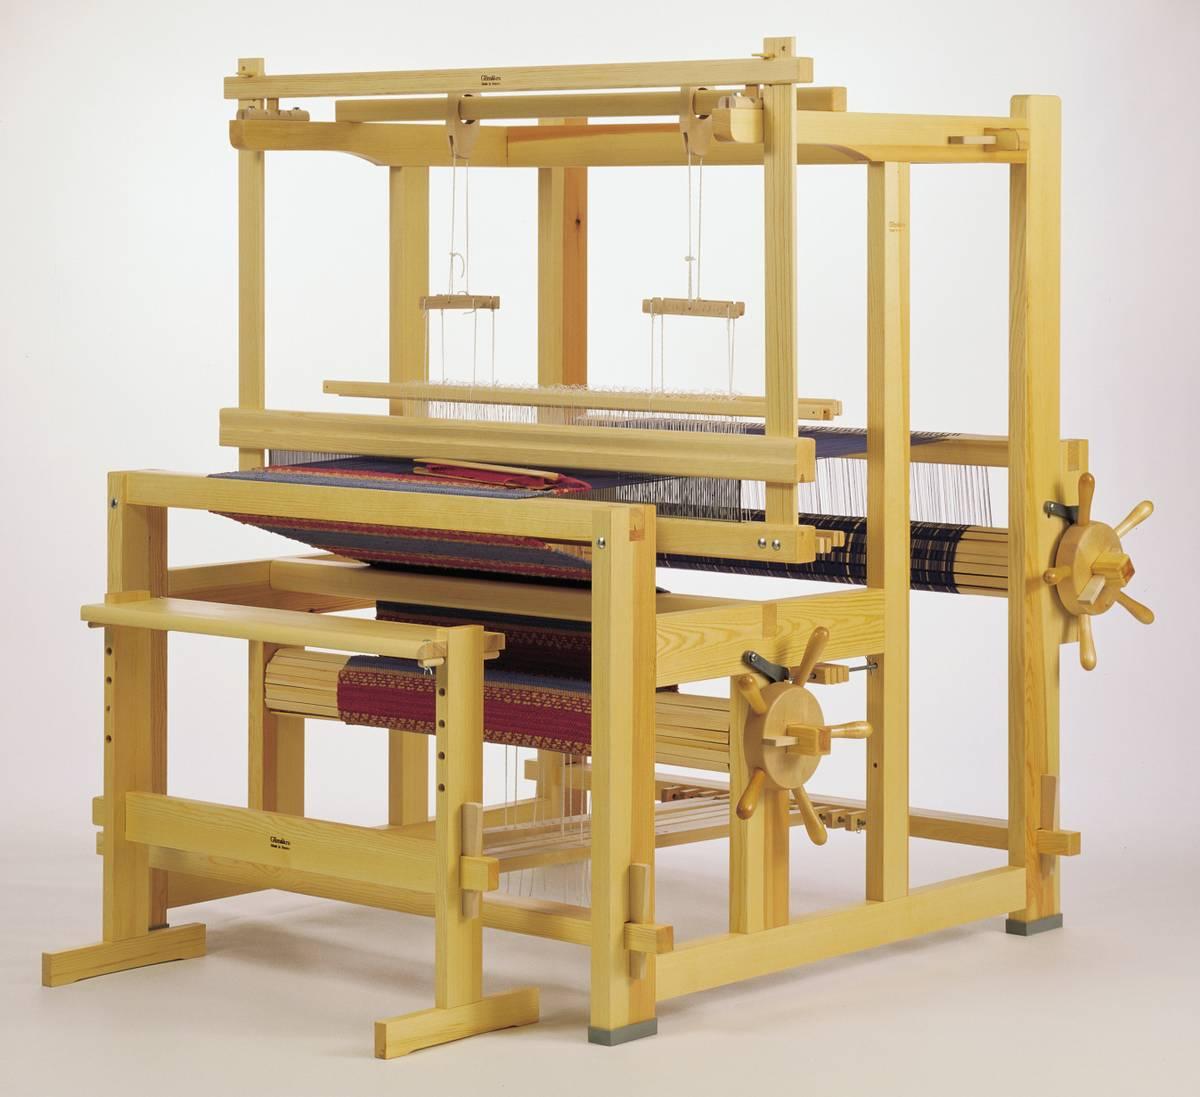 160 cm 4/6 HESTER OG TRINSER. Standard 4 skaft/6 trøer